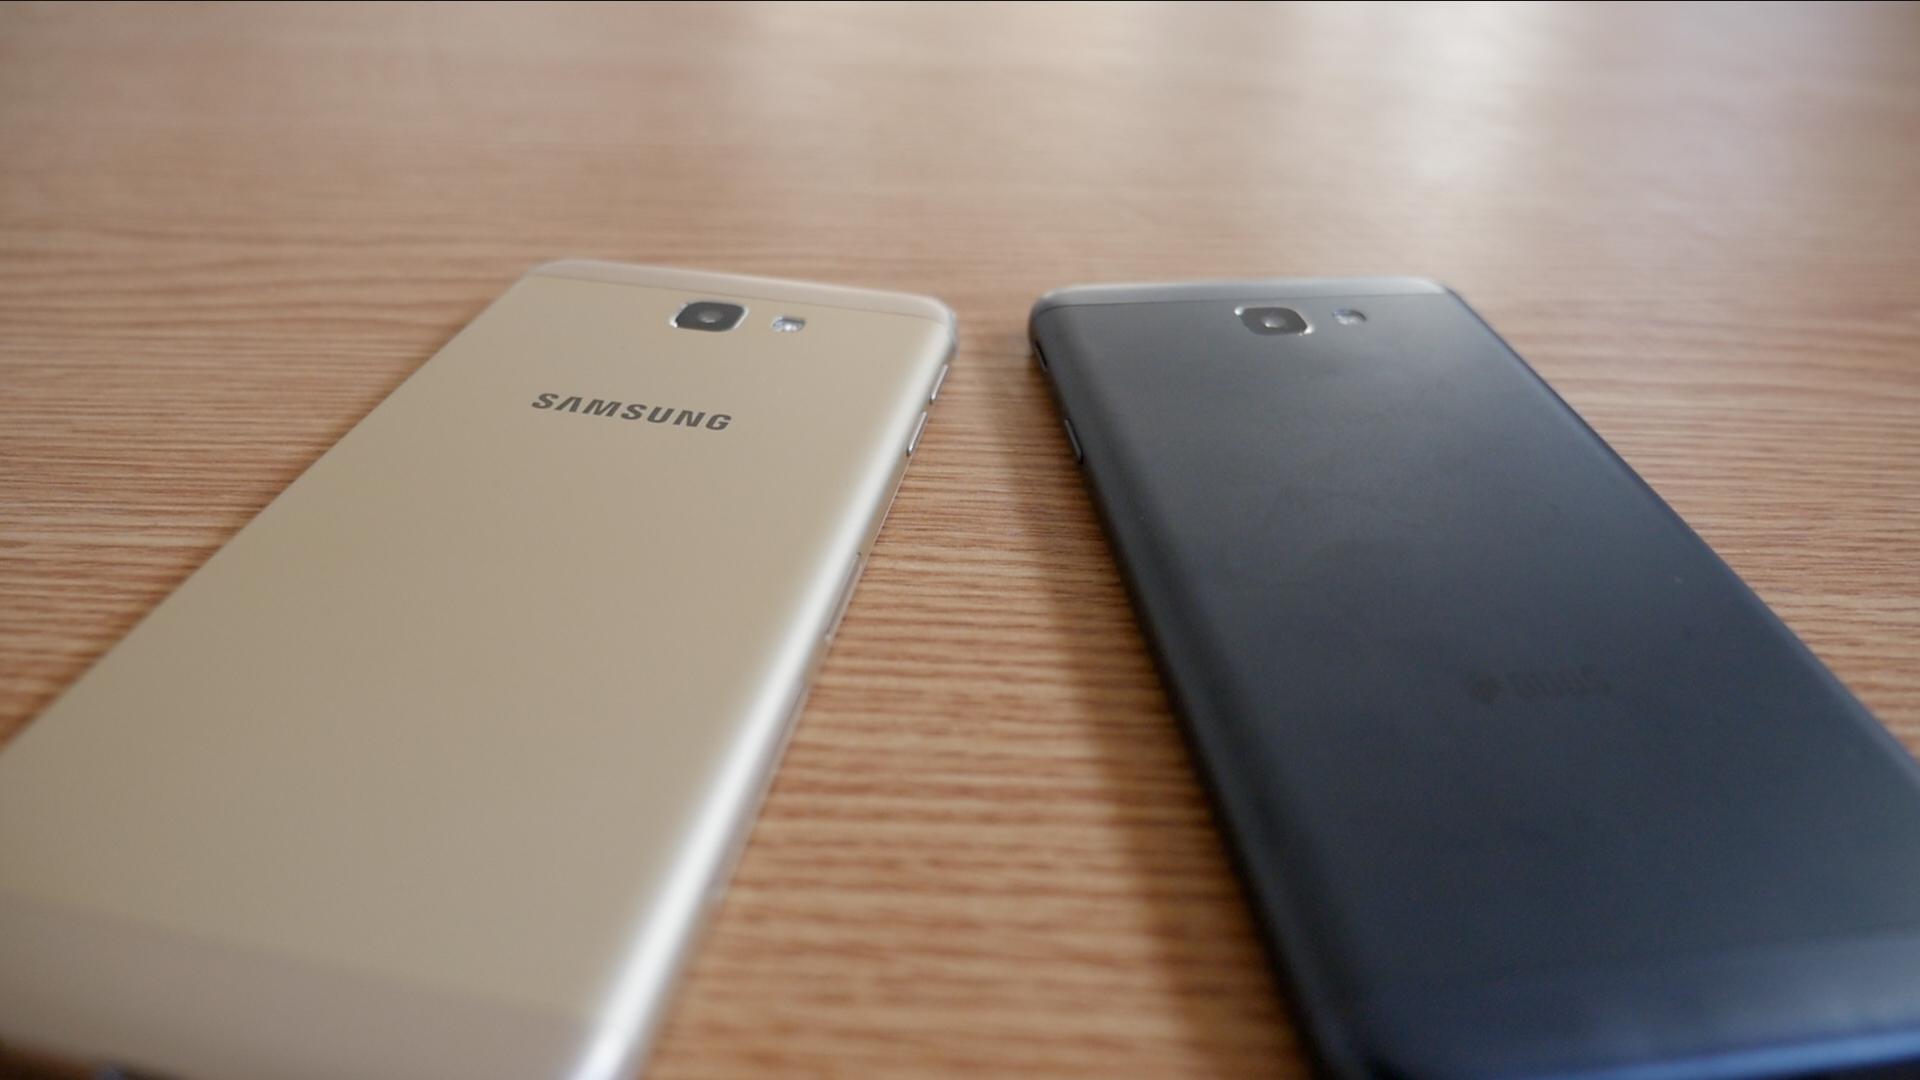 Samsung Galaxy J5 Prime 16 Gb Gold